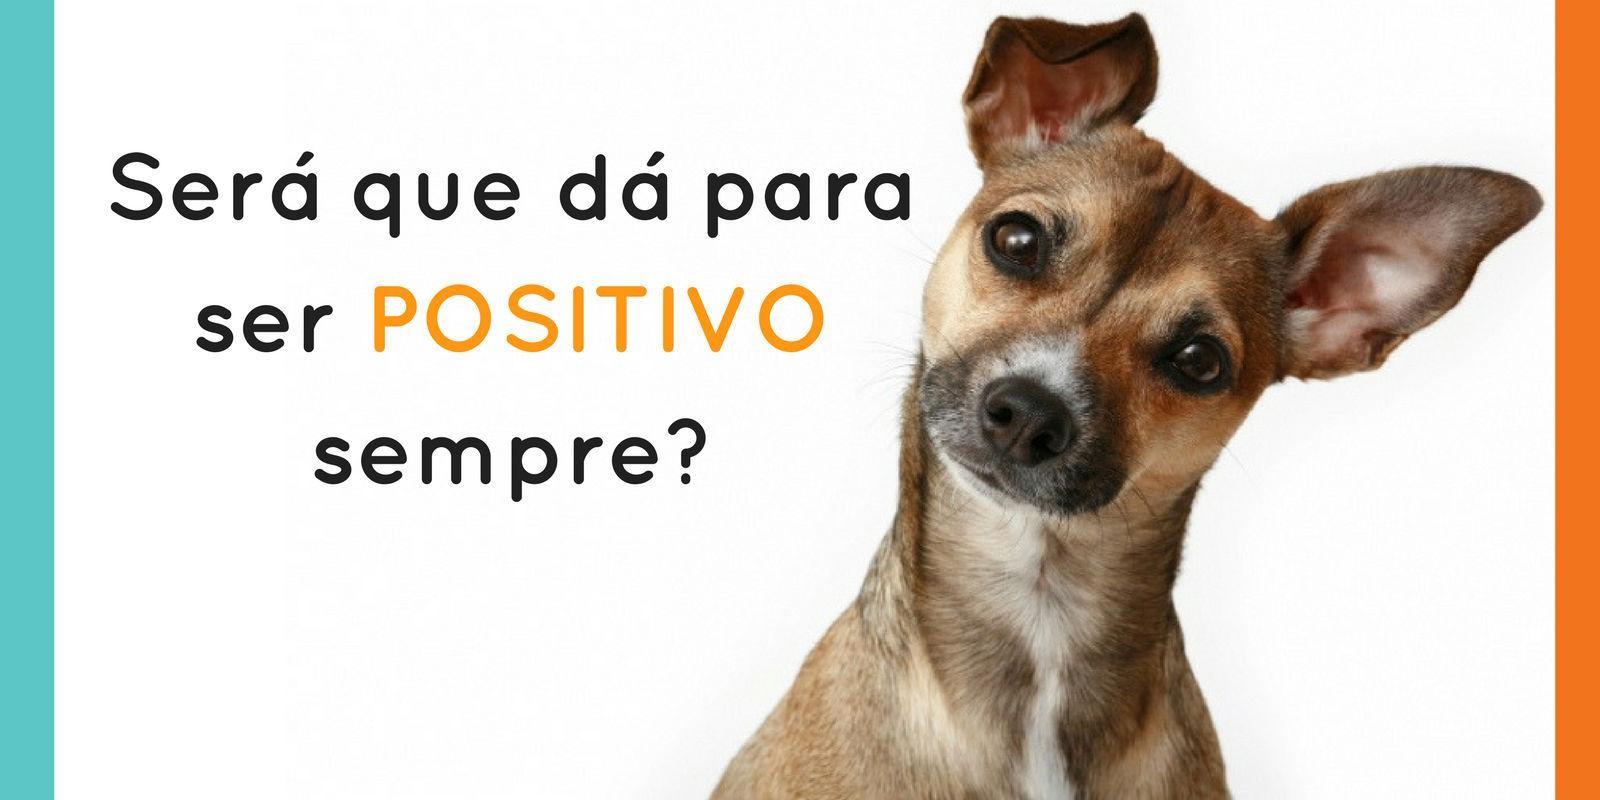 Lambeijos, Carla Ruas - Será que dá para ser POSITIVO sempre?